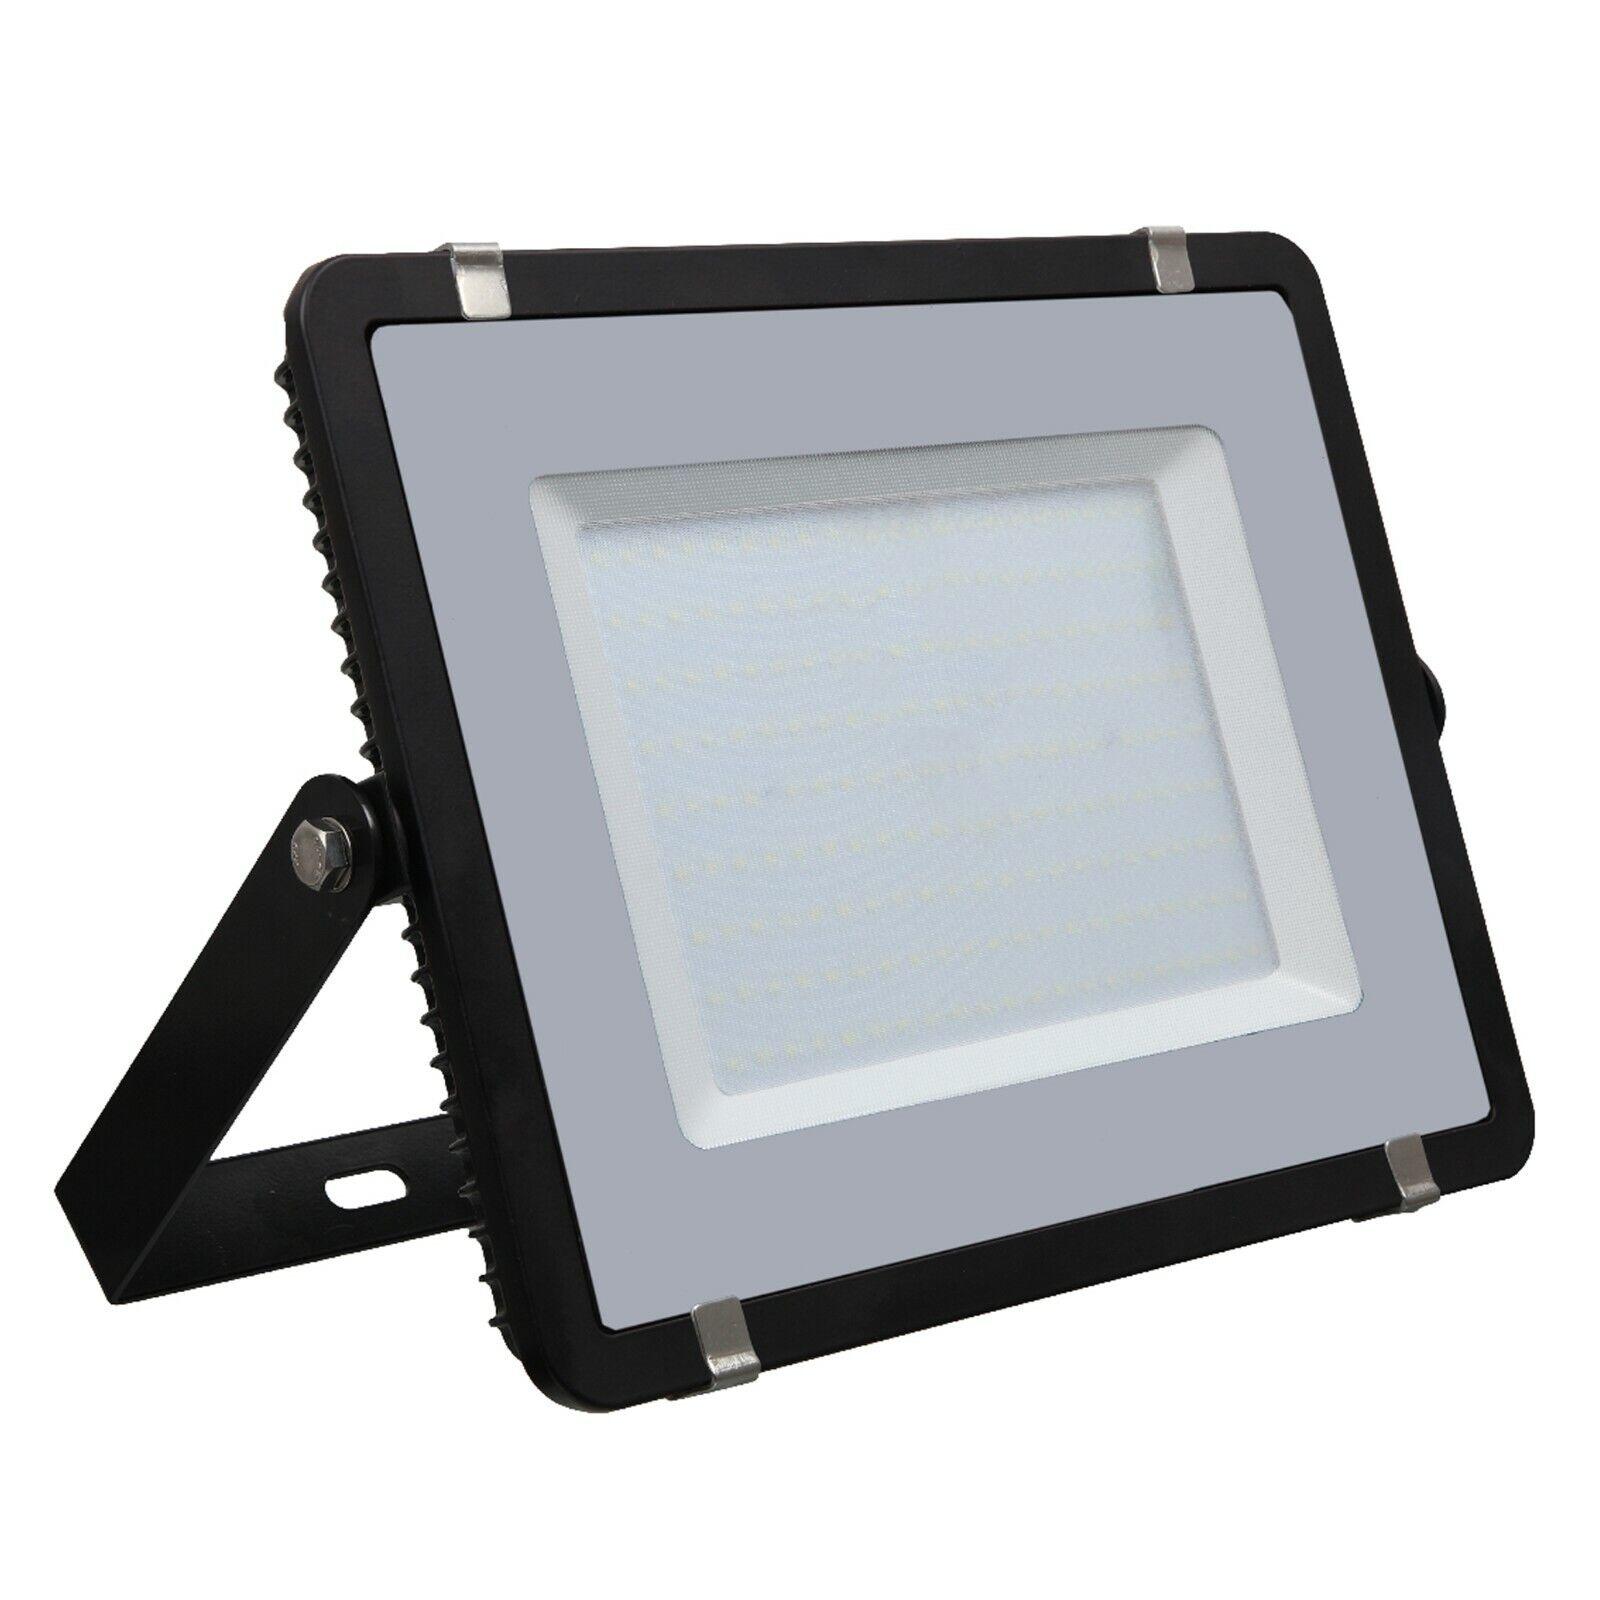 LED Floodlight 200W SMD IP65 Samsung LED Cool Weiß 6400K